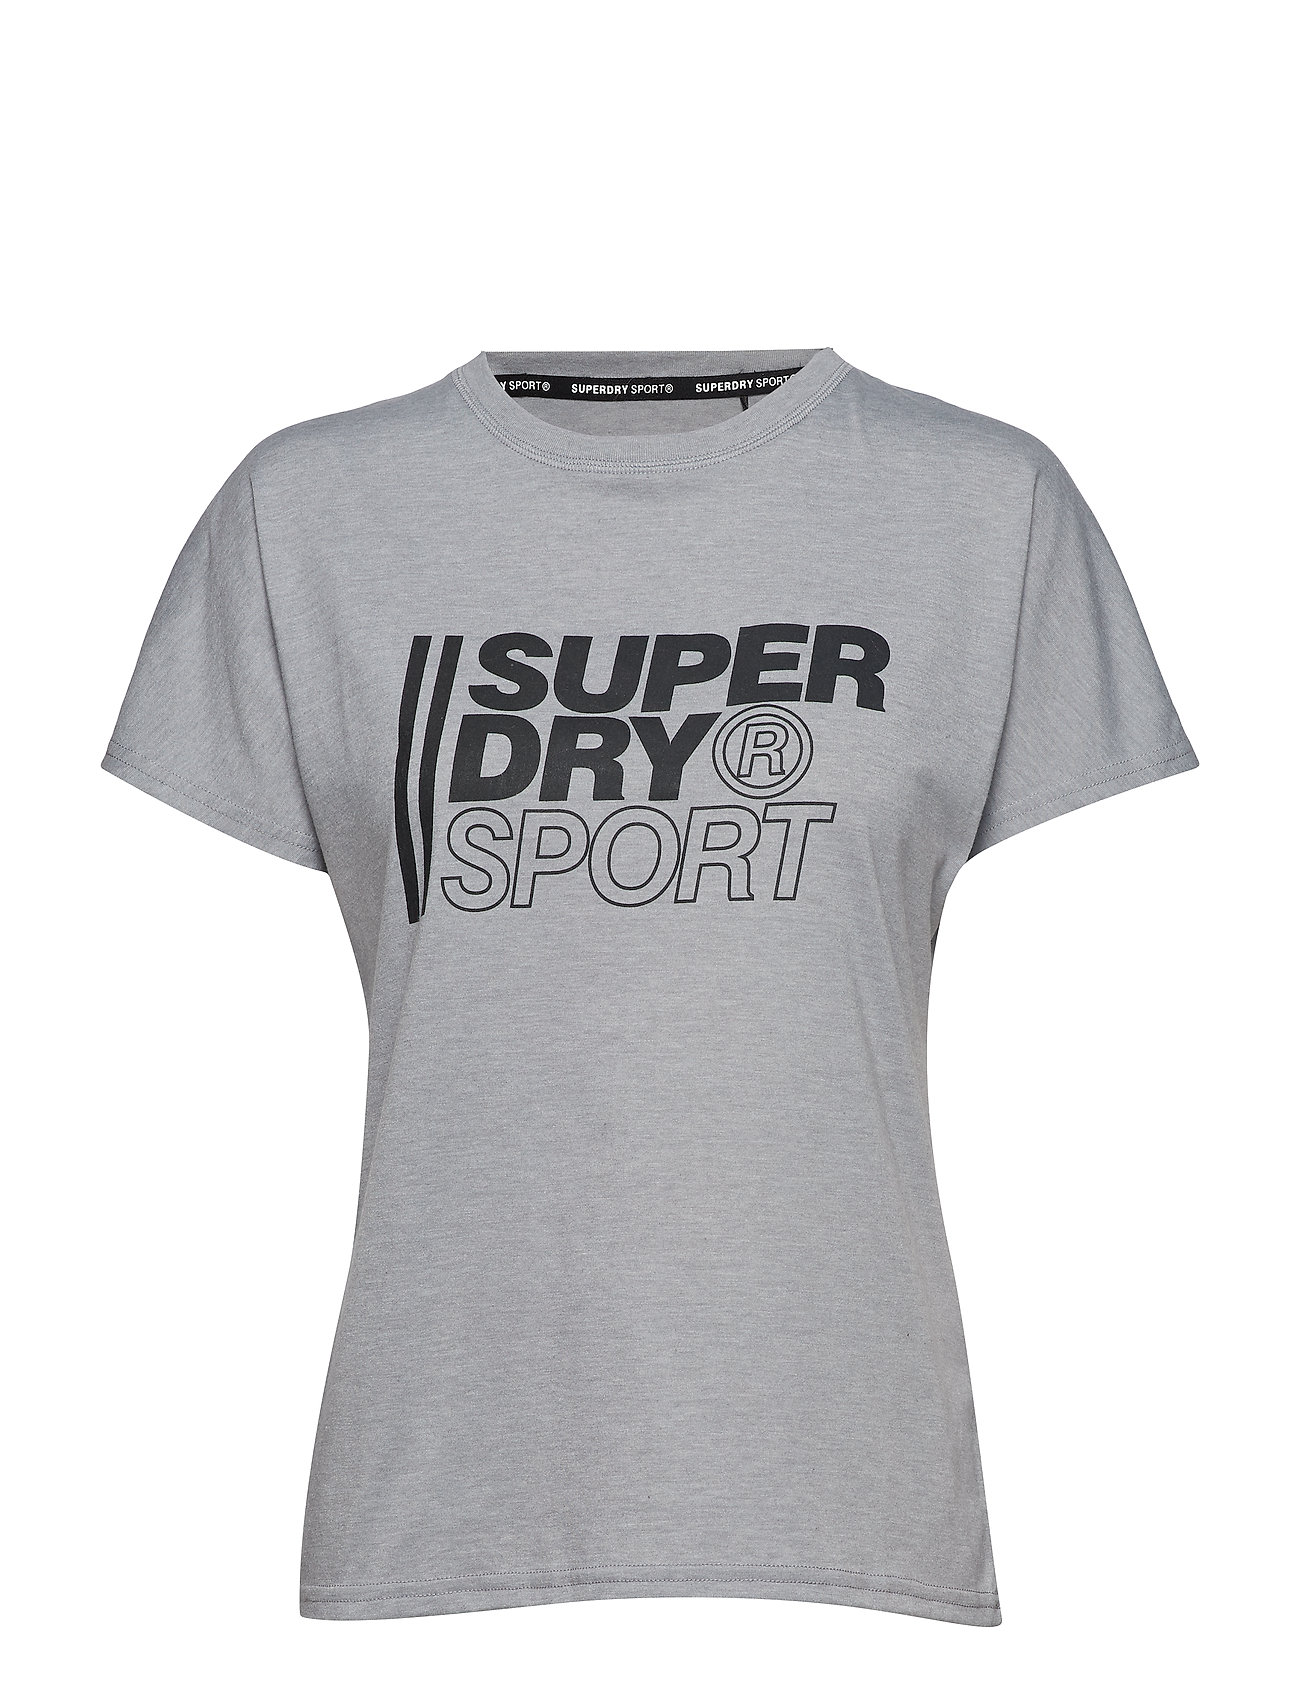 Sport Sport Teegrey Teegrey Core MarlSuperdry Graphic MarlSuperdry Core Graphic DWEH29I